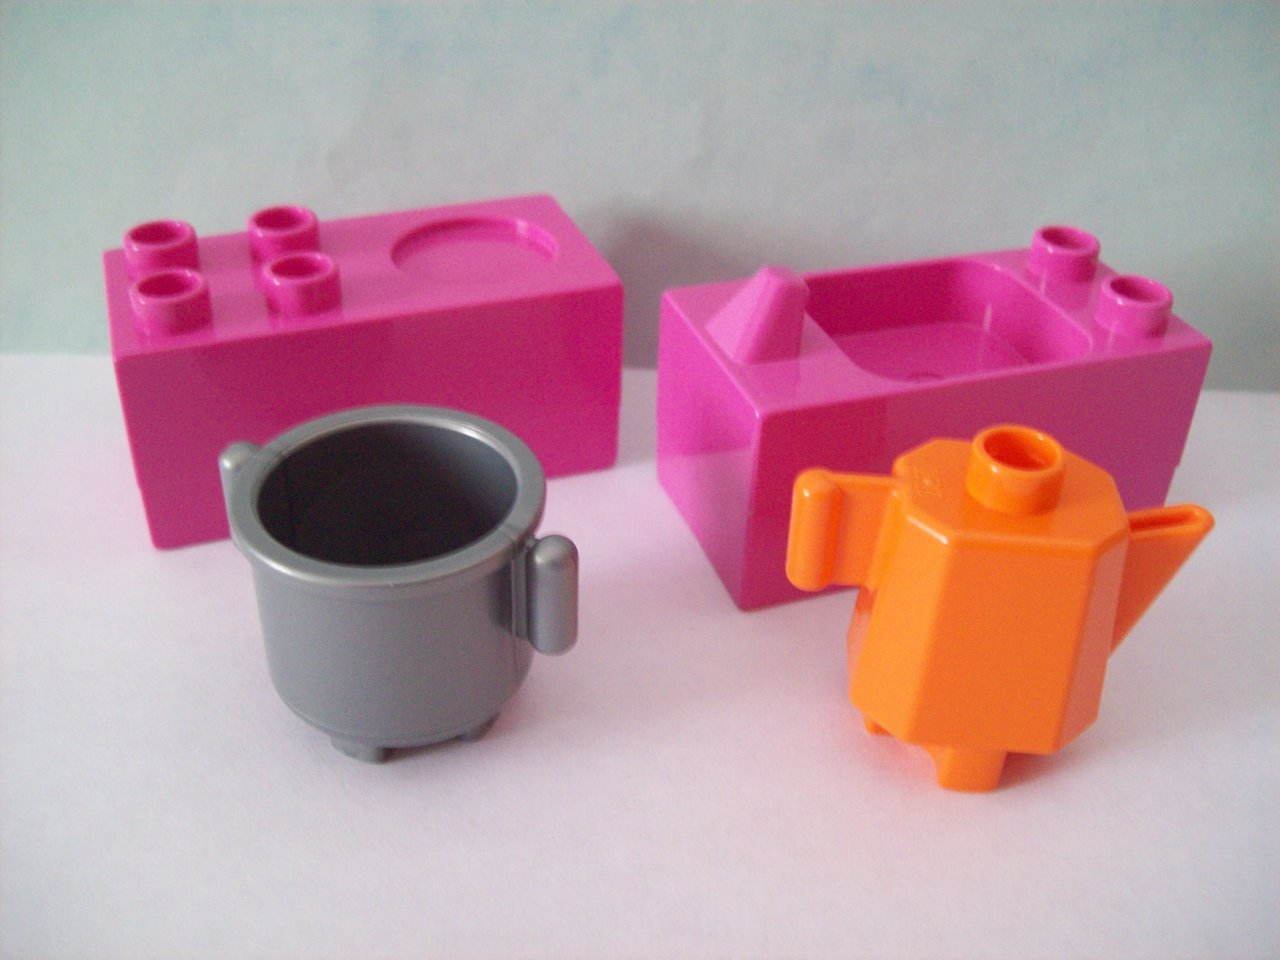 lego duplo 10505 familienhaus kinderk che rosa herd sp le mit topf und kanne neu stonebrick. Black Bedroom Furniture Sets. Home Design Ideas